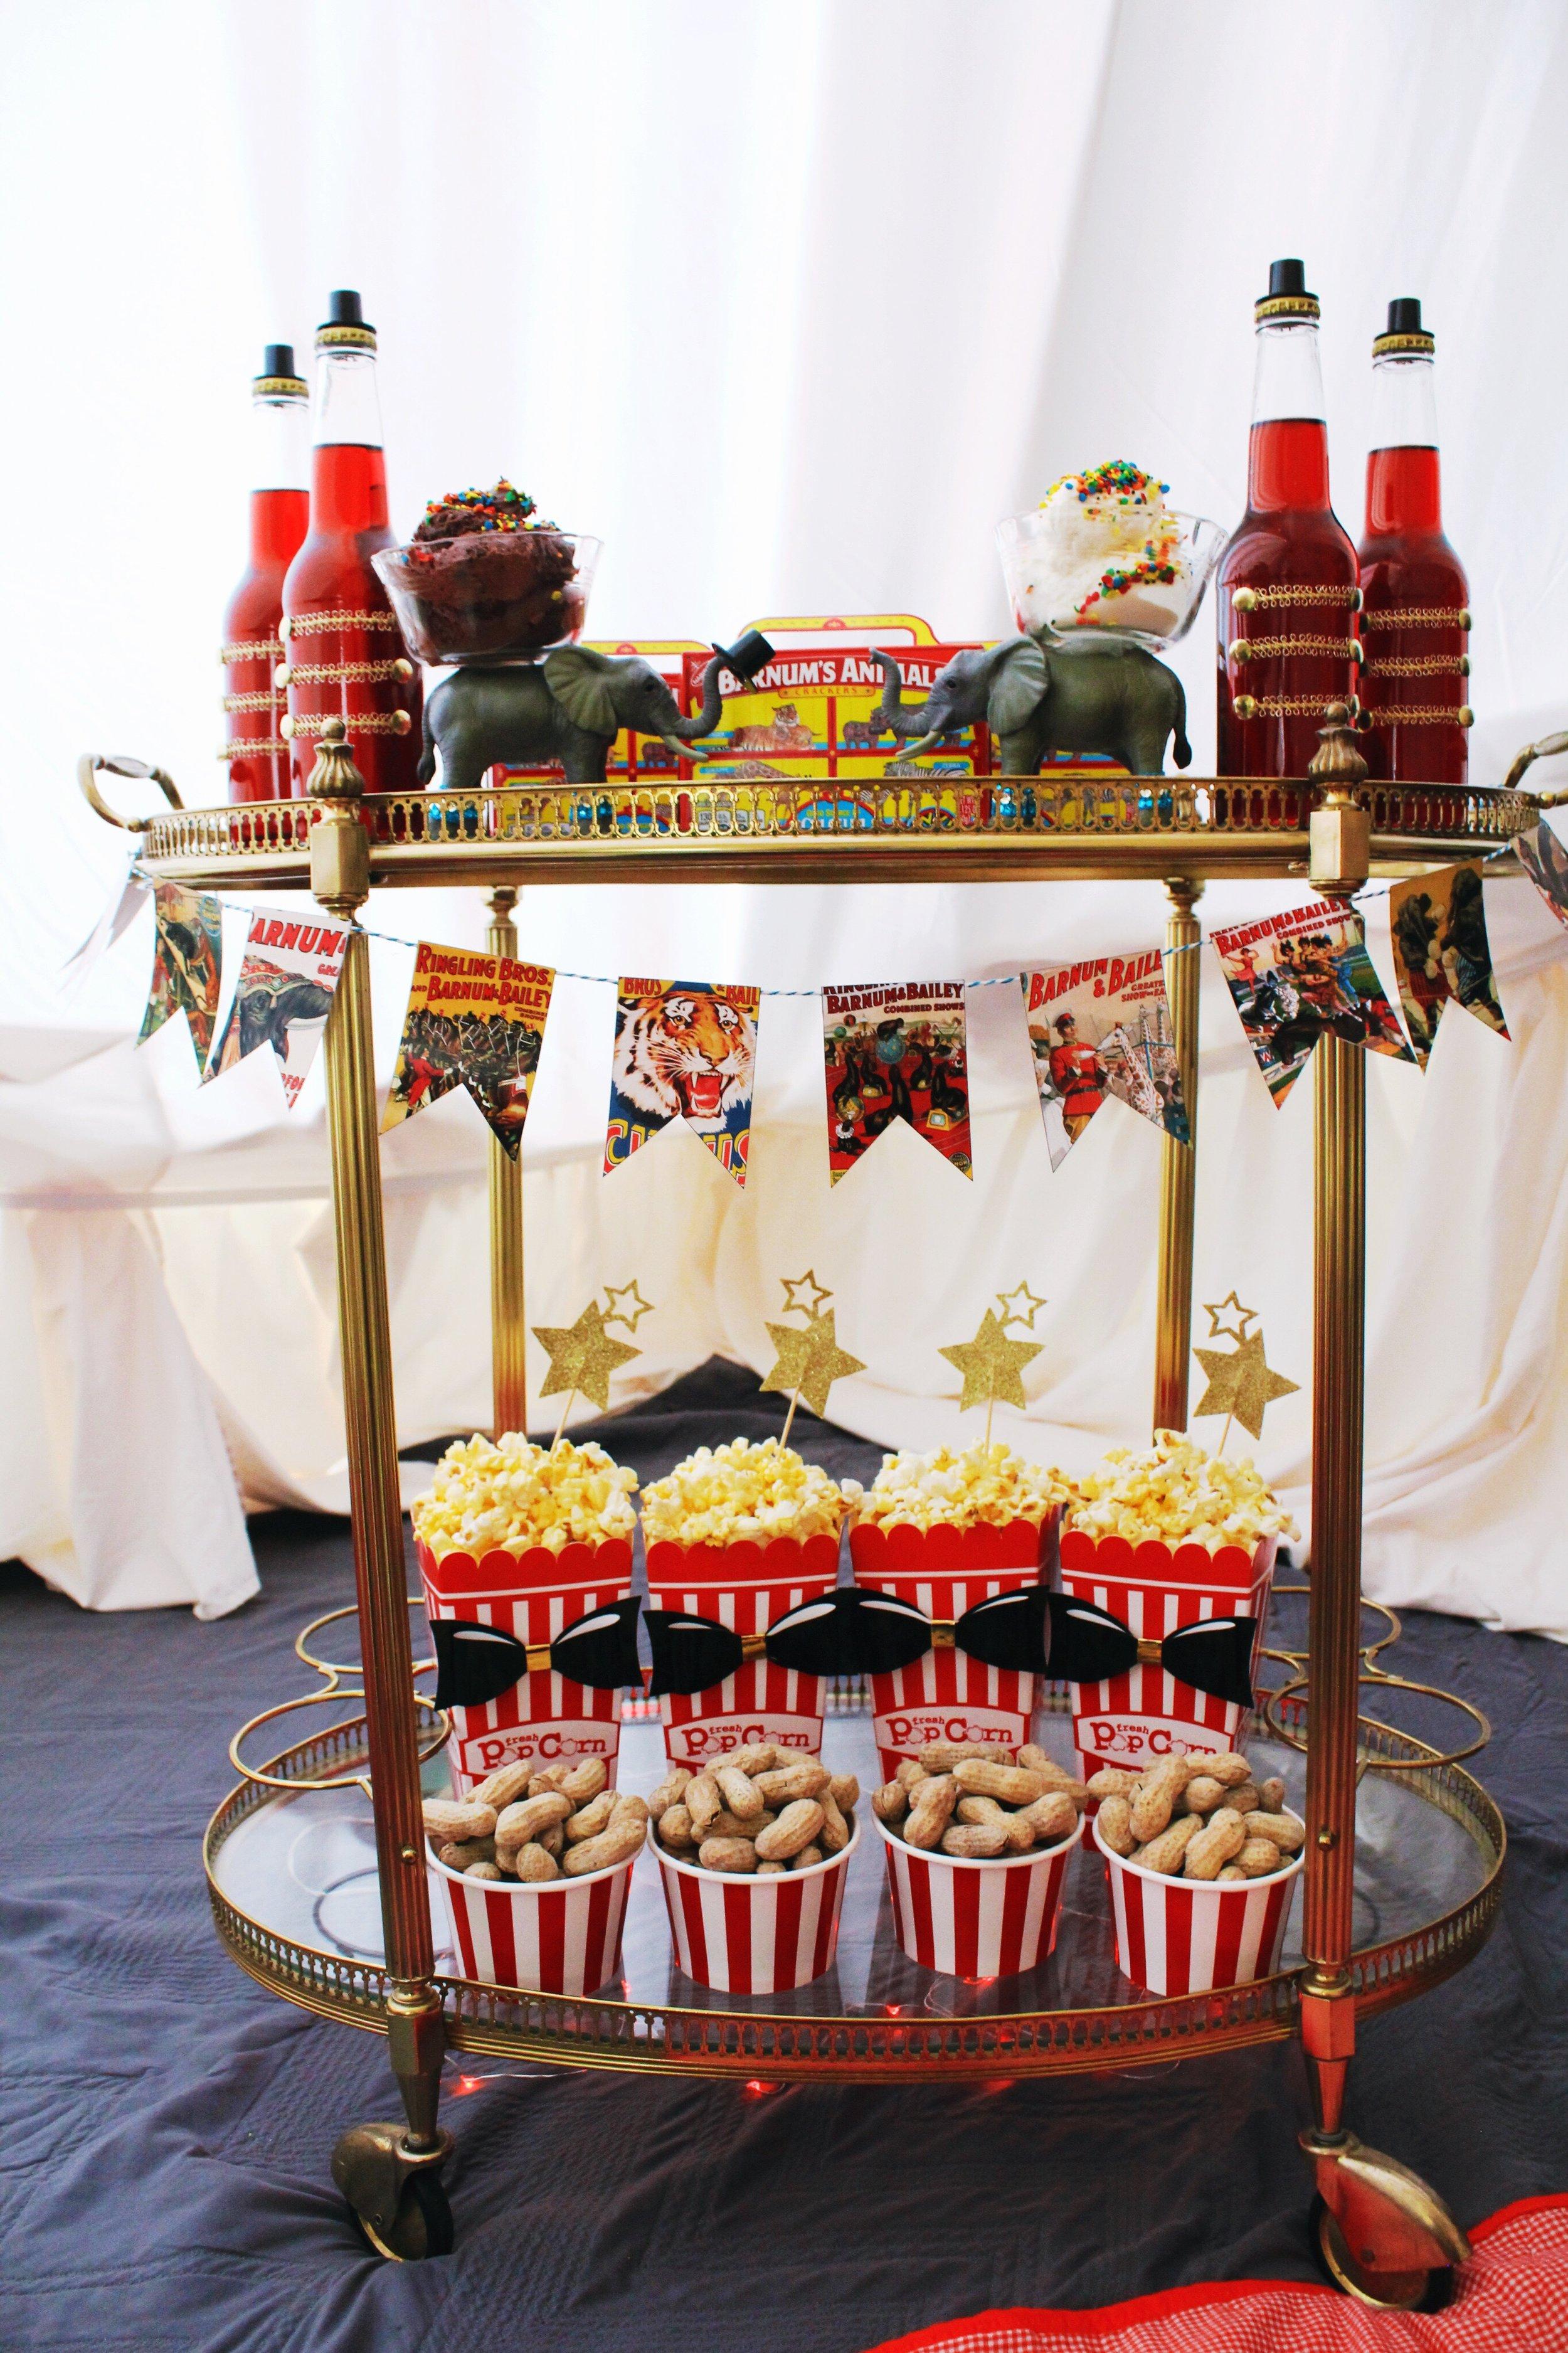 The Greatest Showman Movie Party_Bar Cart_Food Ideas_Circus Tent.JPG